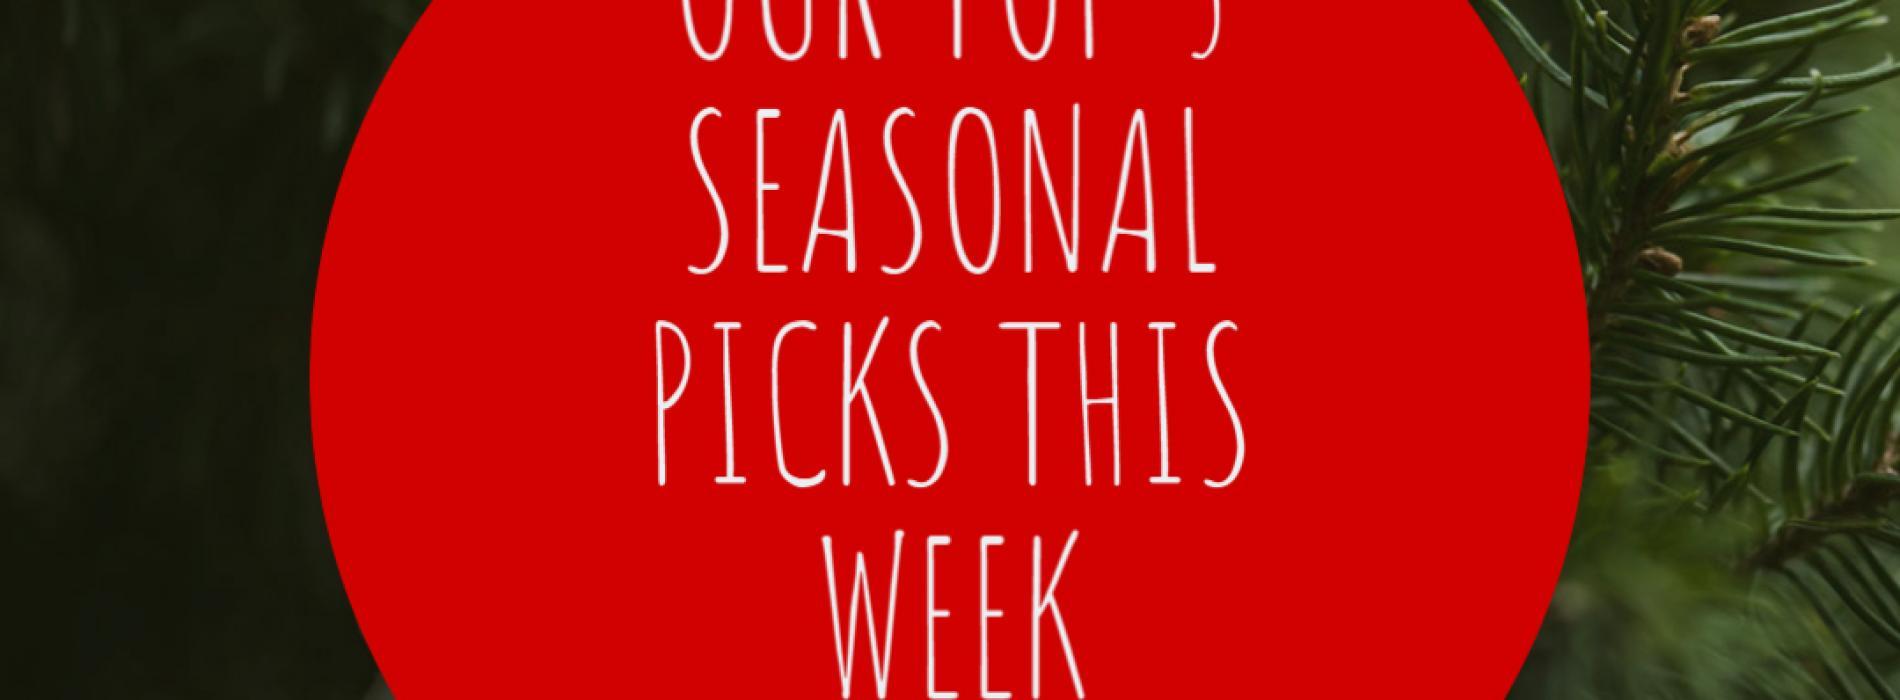 The Top 5 Christmas Picks This Week!